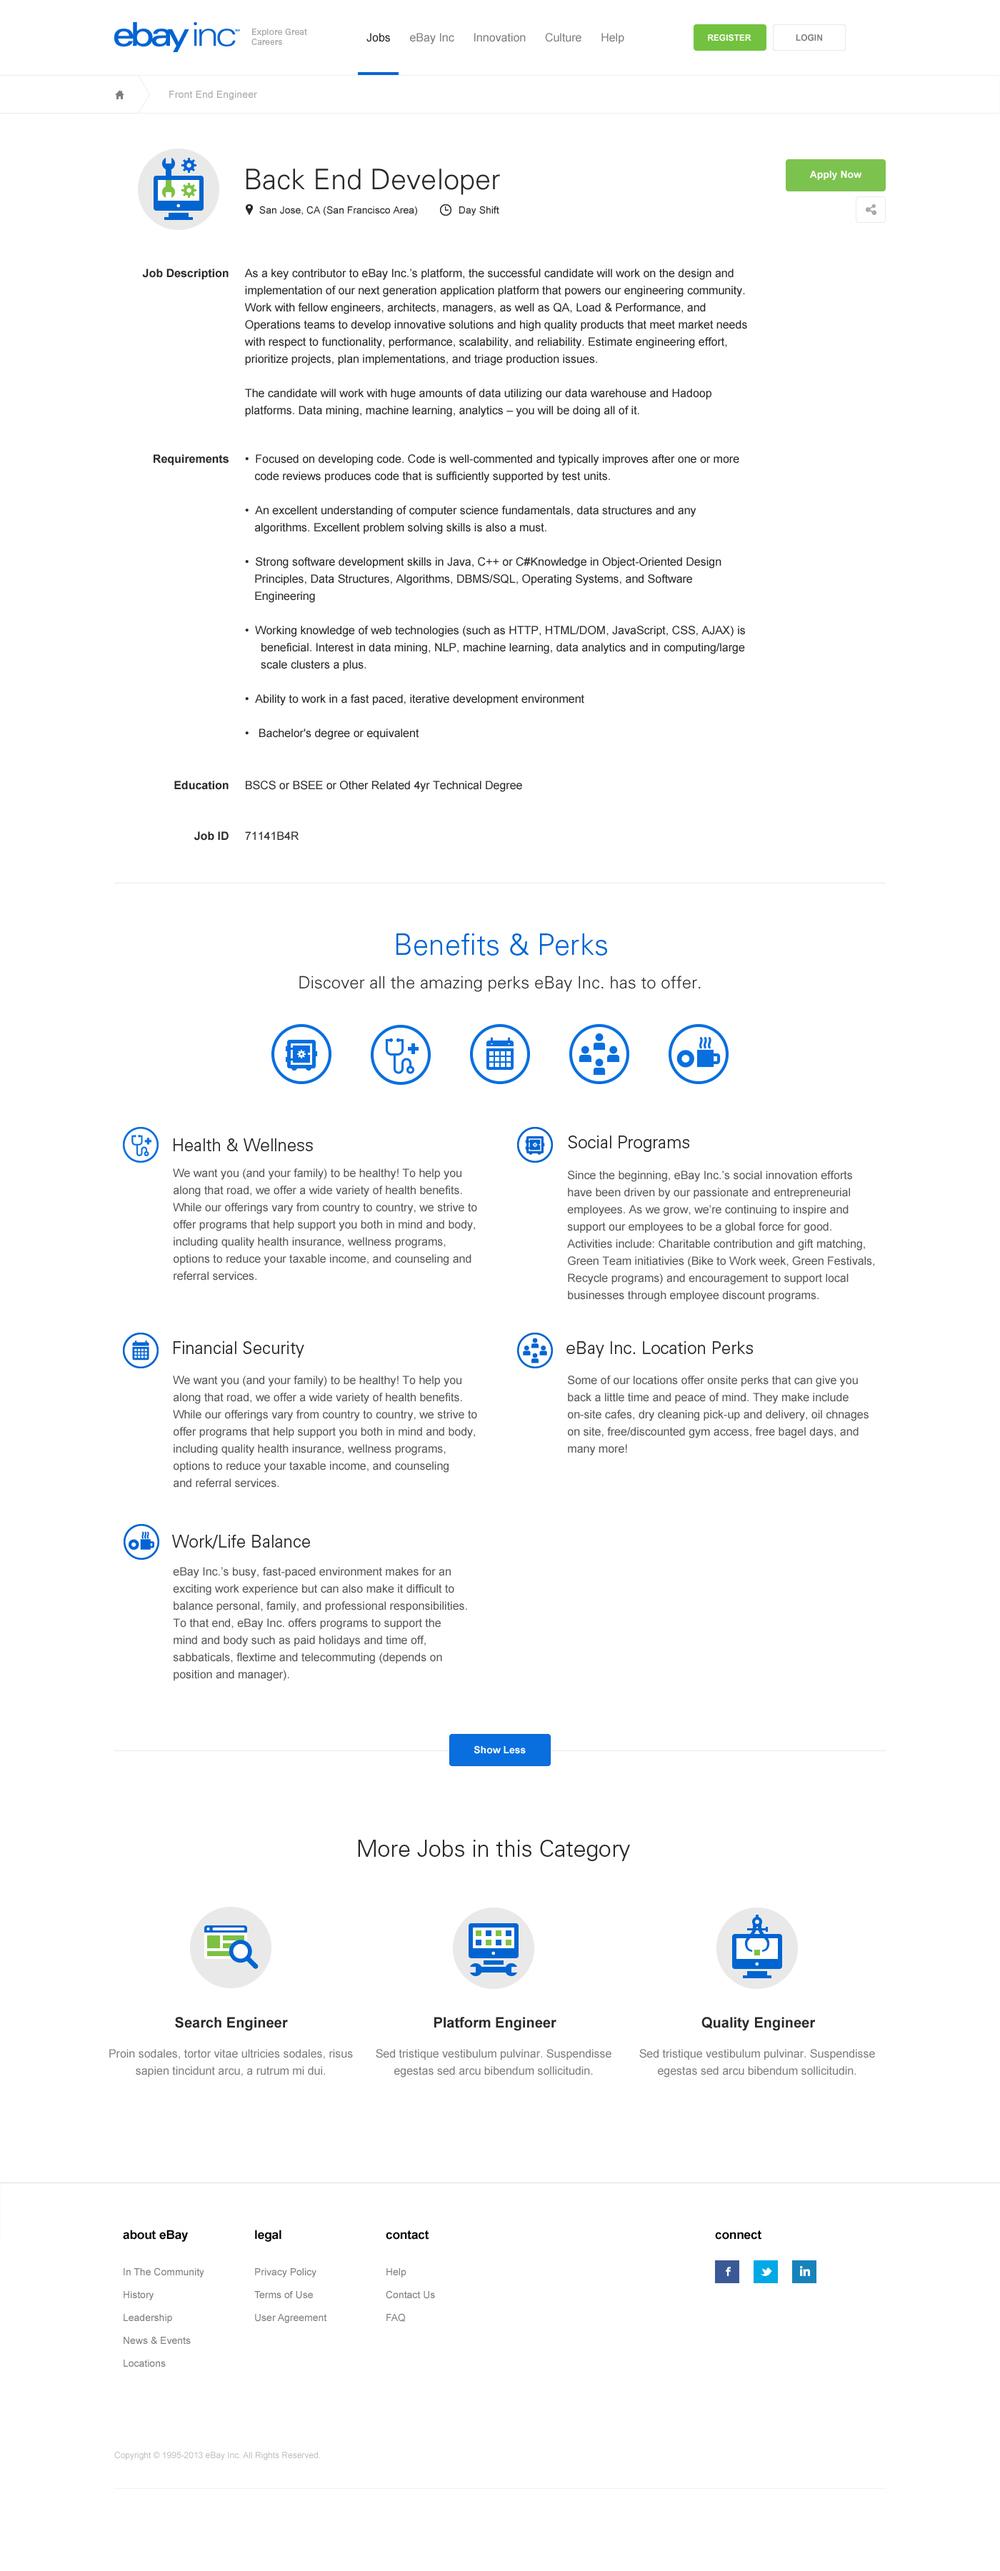 ebaycareers.website1080.jobdetails_expanded_1.4.jpg